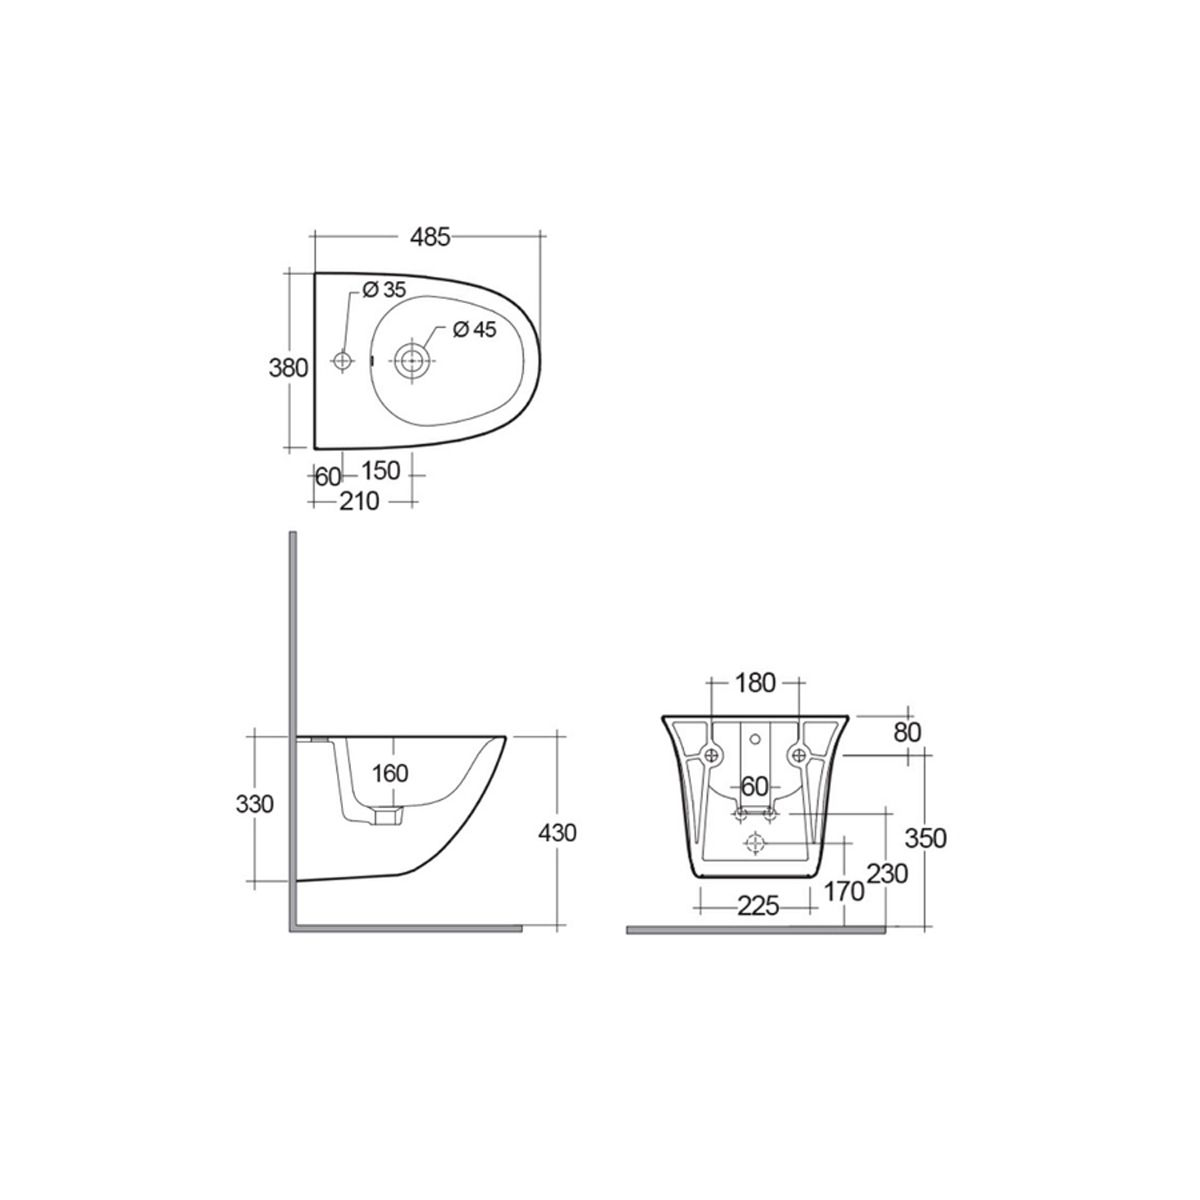 RAK Sensation Mini Wall Hung Bidet Measurements